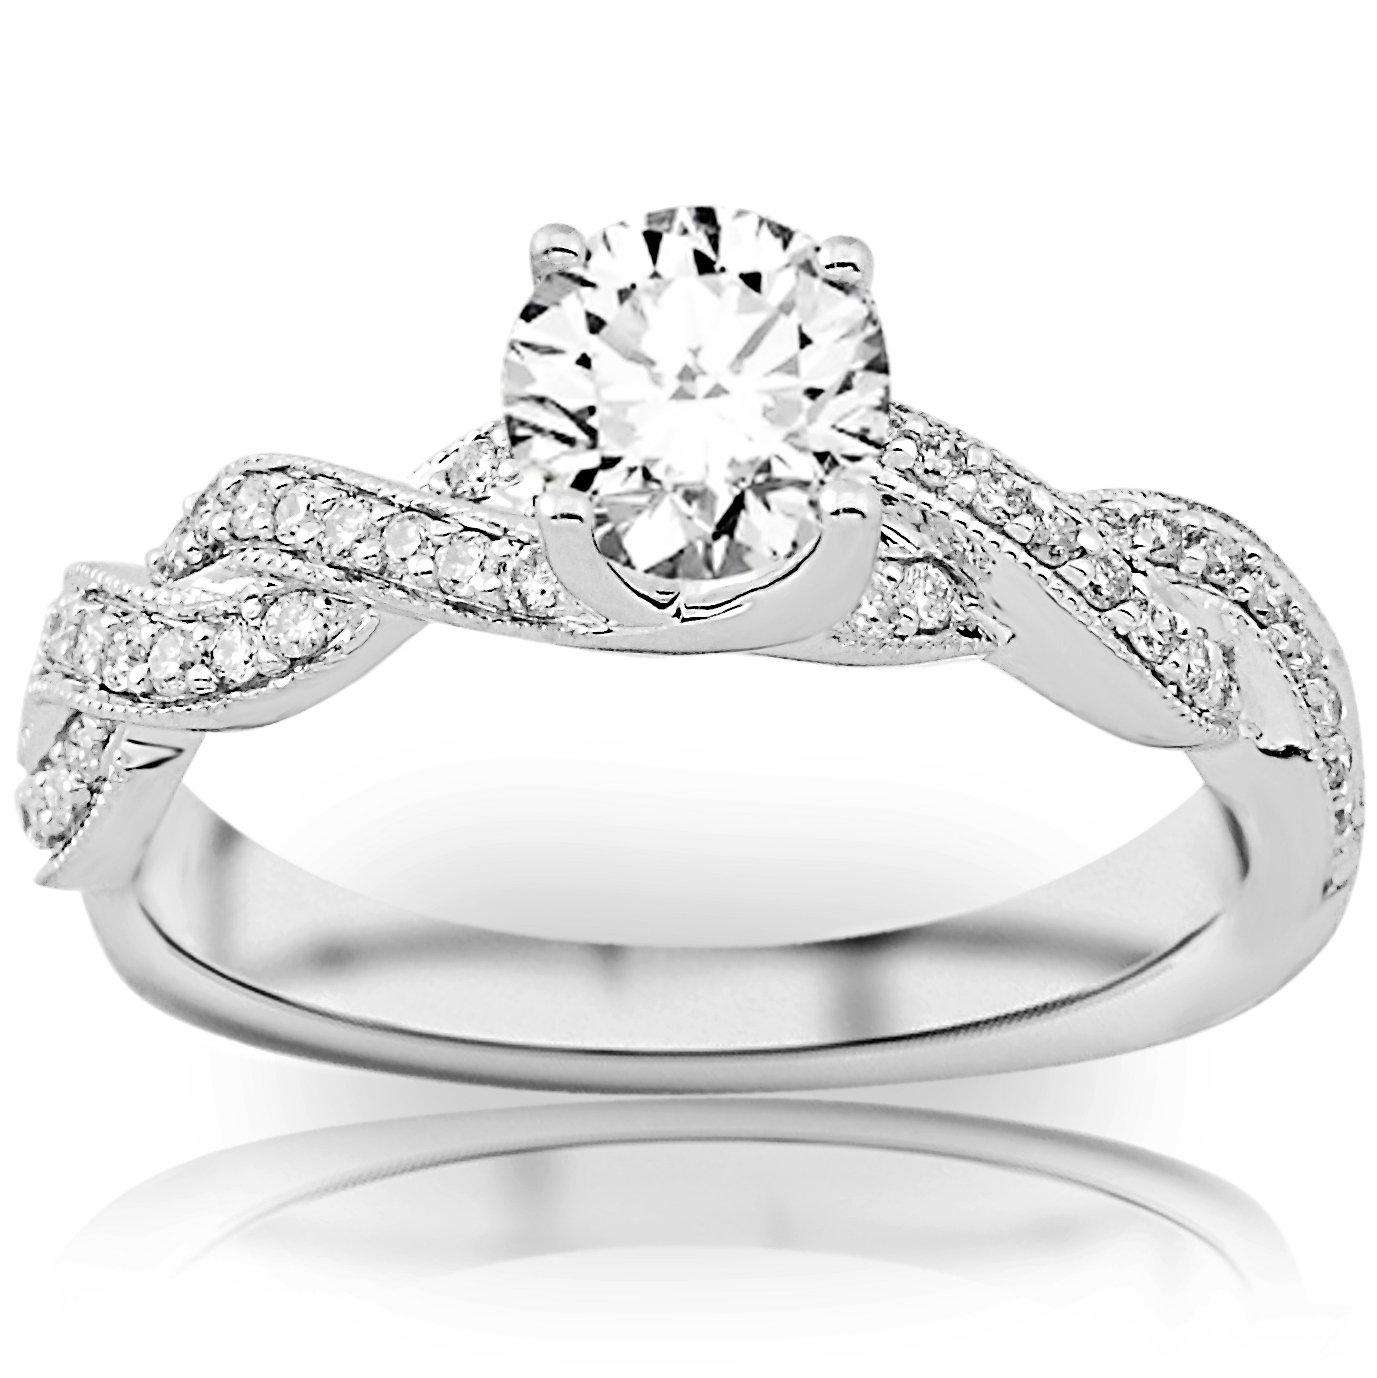 0.65 Carat Round Cut Twisting Designer Eternity Love Split Shank Diamond Engagement Ring With Milgrain (D-E Color, I2 Clarity) by Houston Diamond District (Image #1)